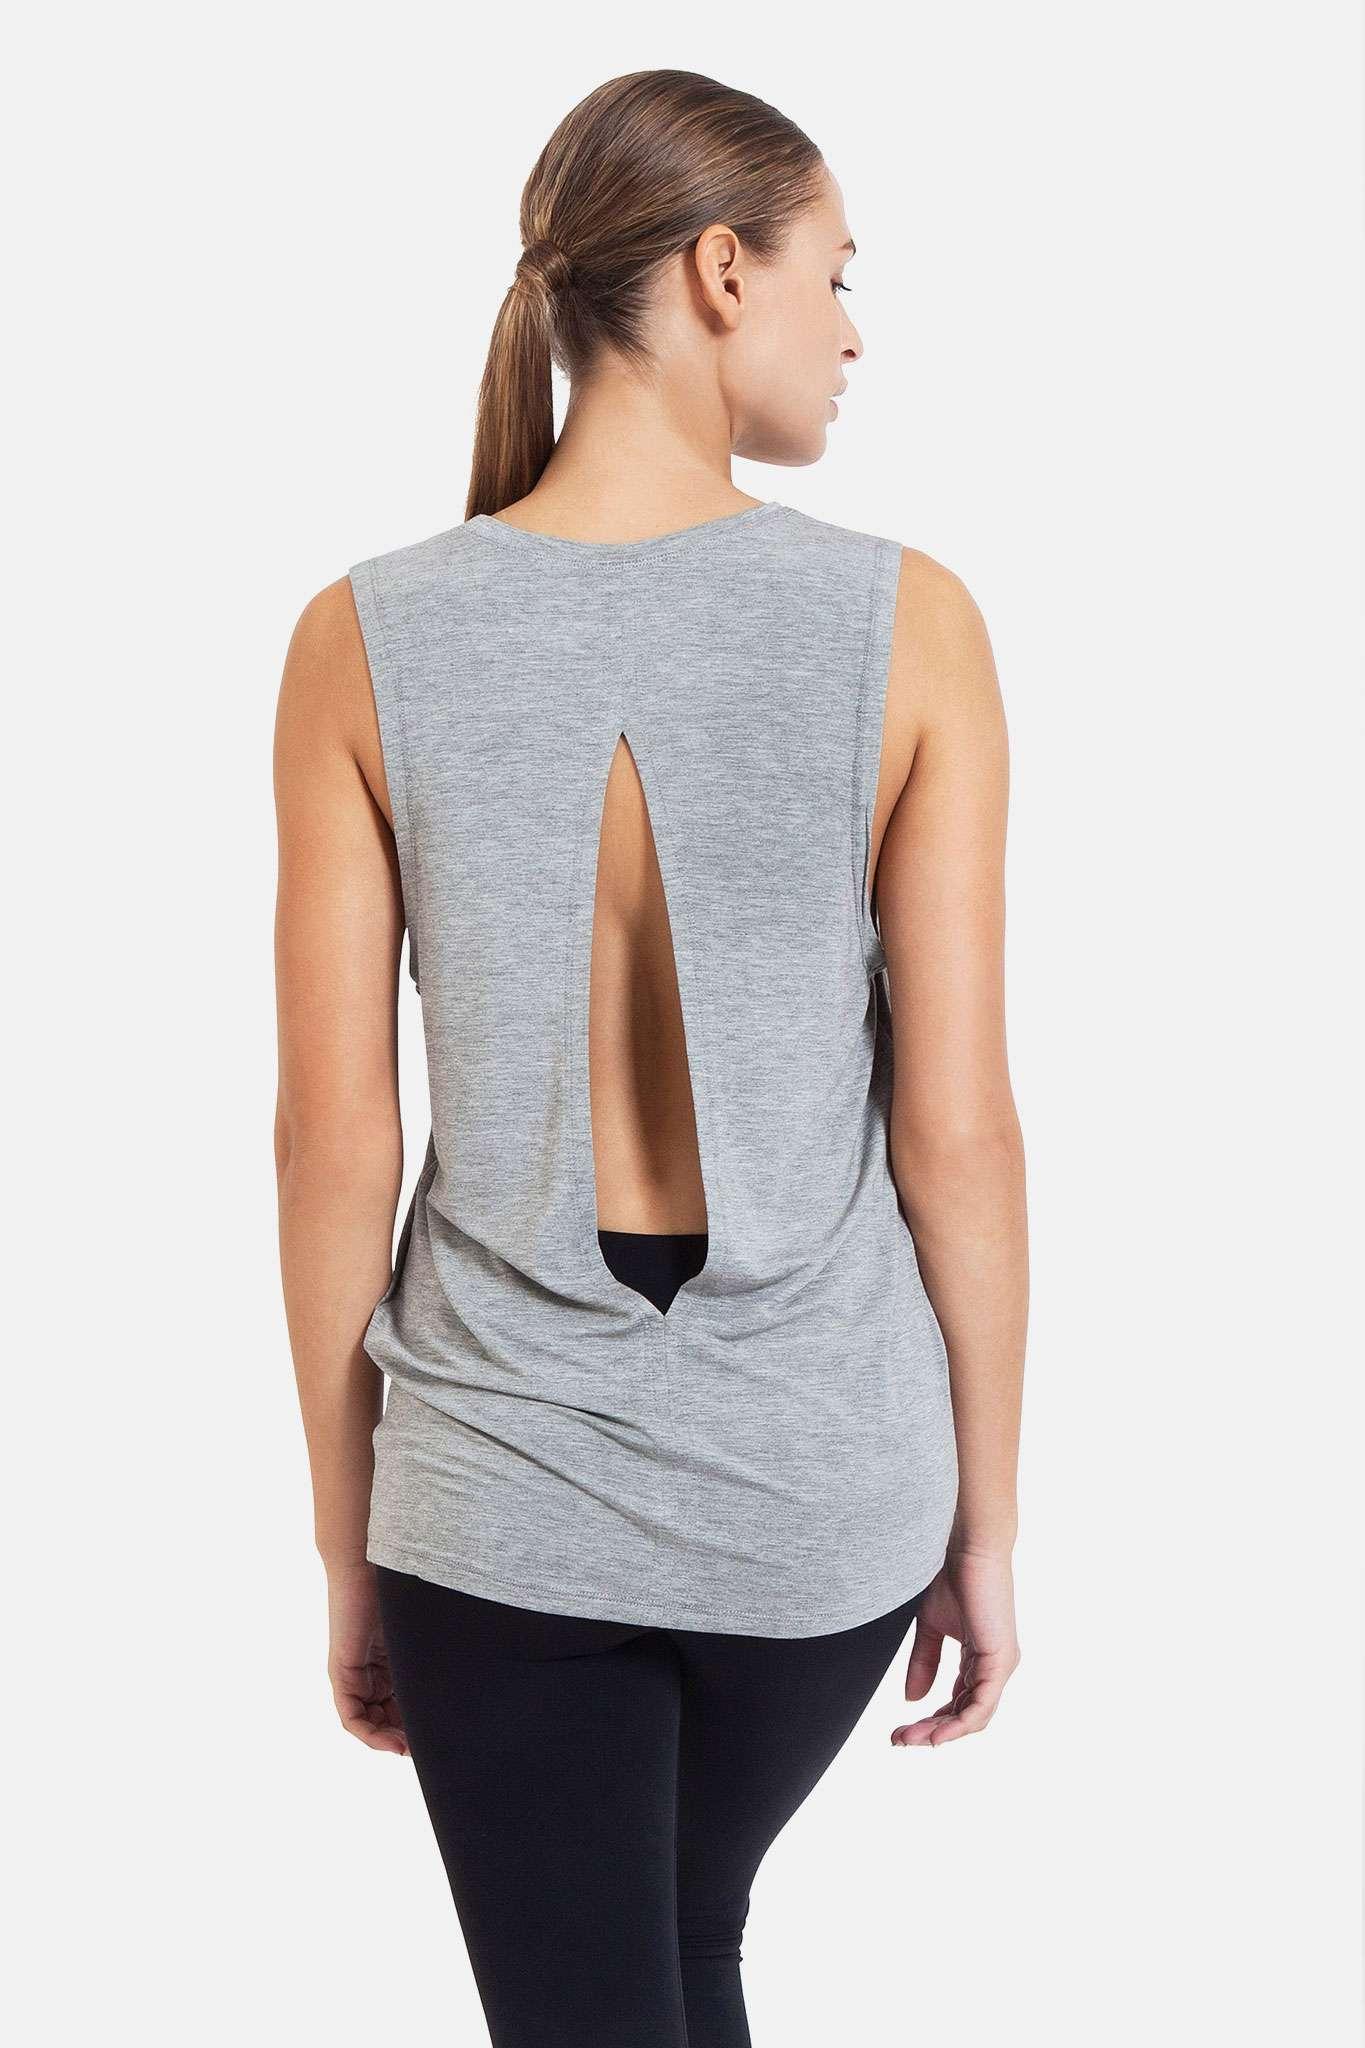 dharma bums diamond back yoga tee tank vest - melange grey